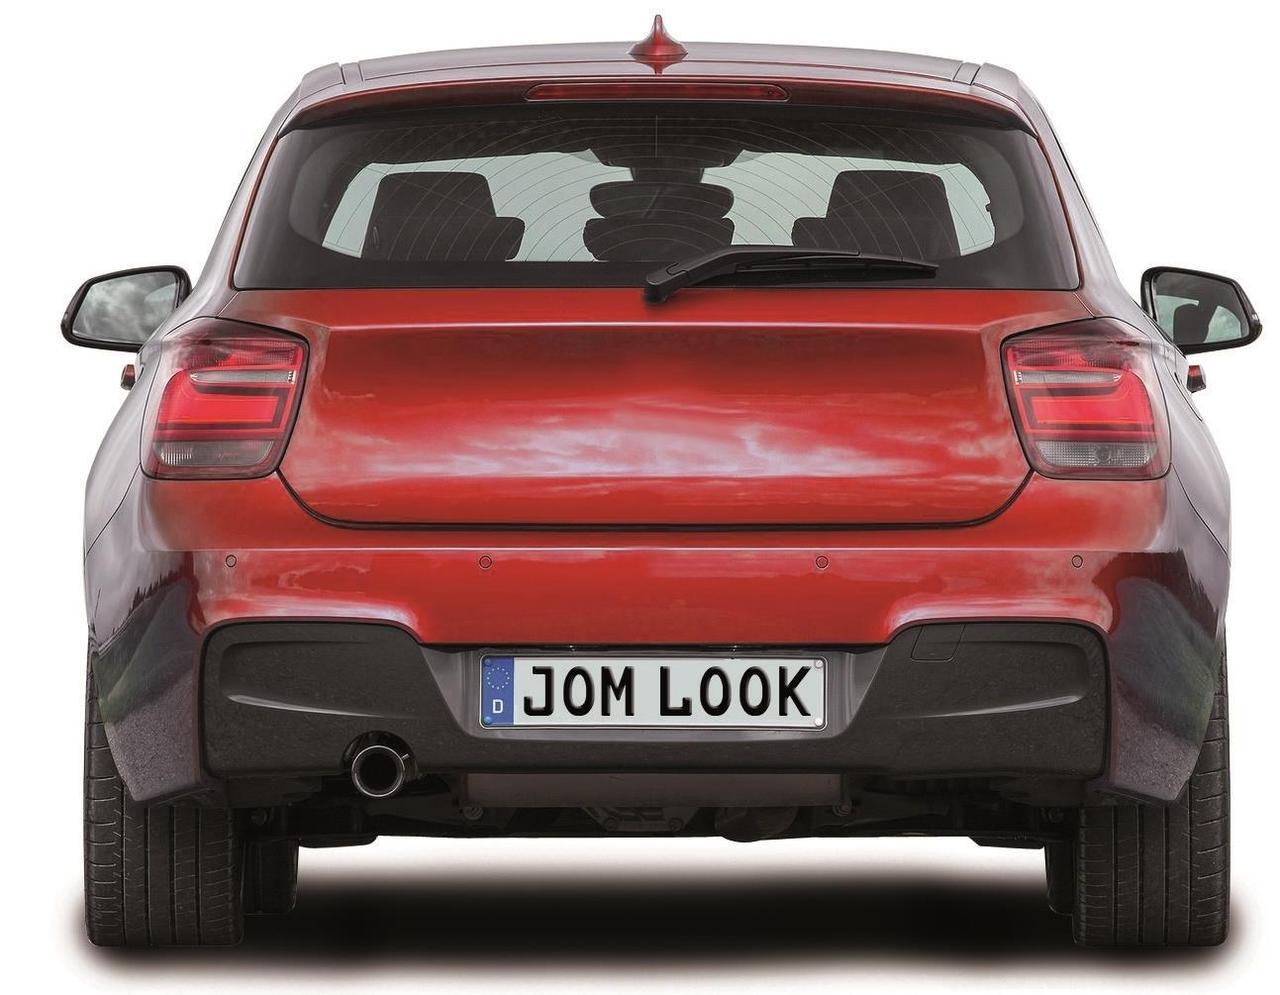 Body kit pachet sport pentru BMW F20/21, model fabricat 2011-2015